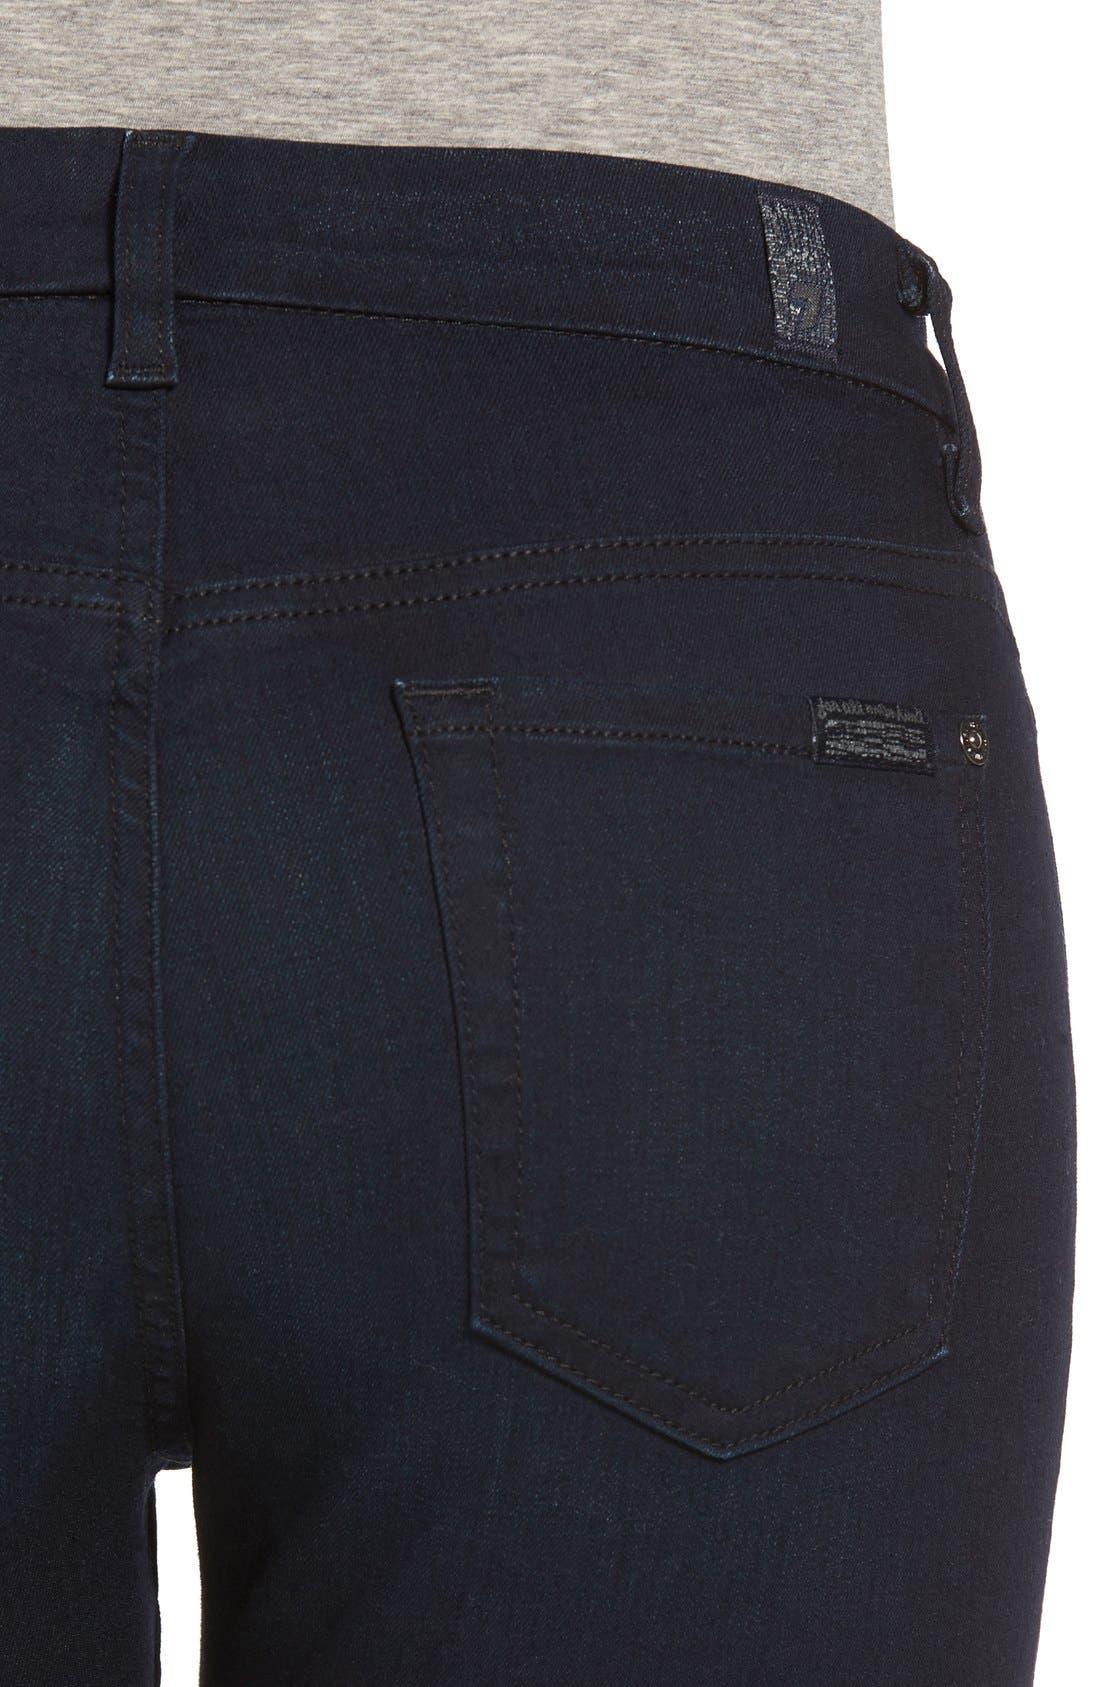 Alternate Image 4  - 7 For All Mankind b(air) High Waist Skinny Jeans (Blue/Black River Thames)